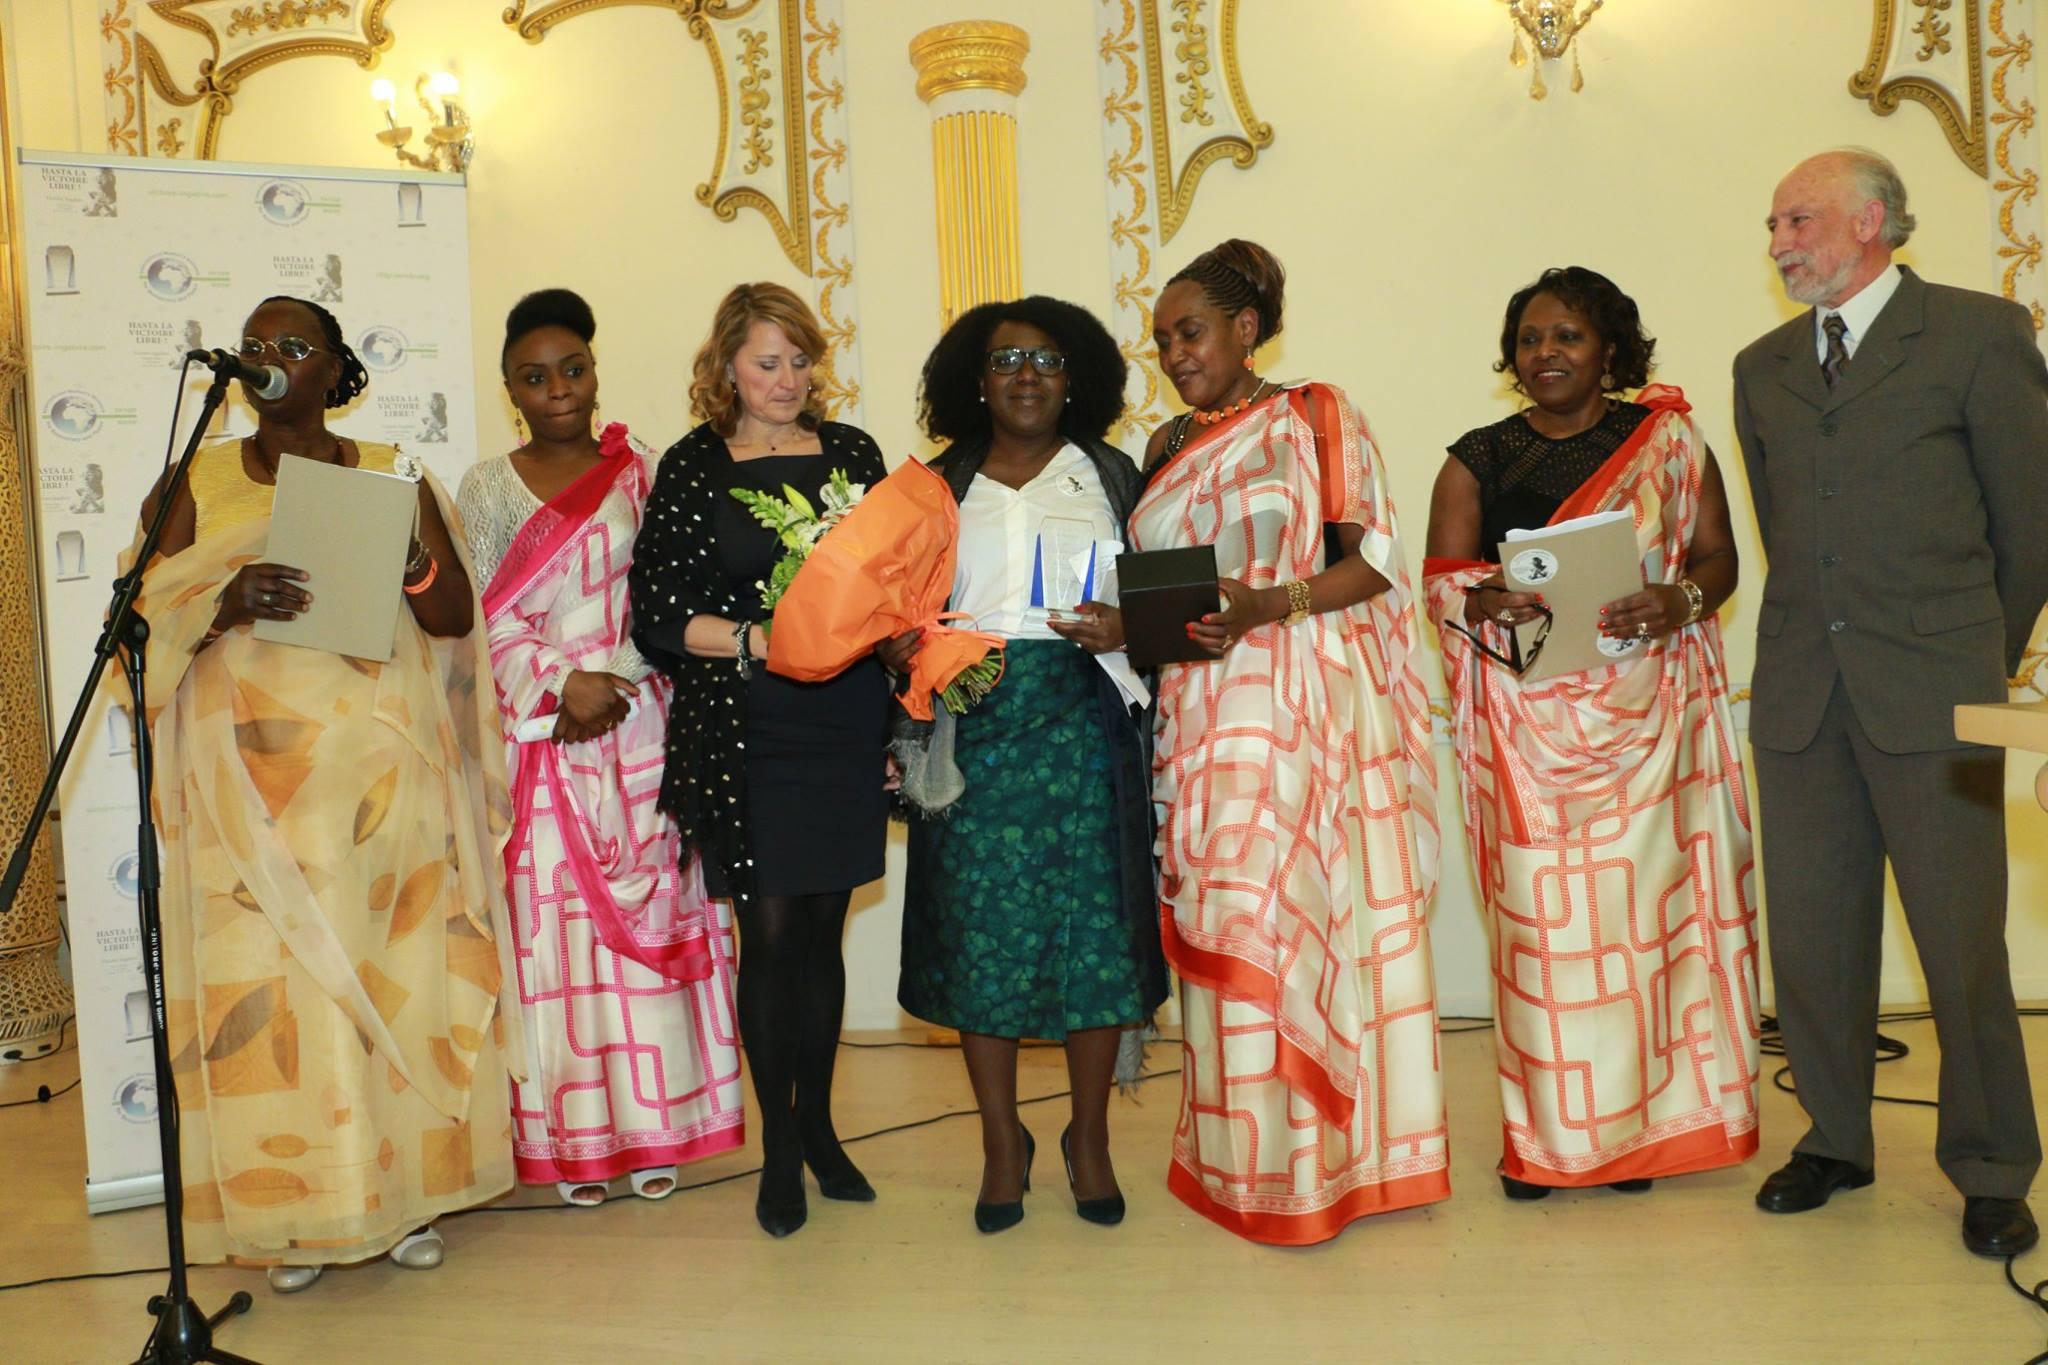 essays org momento de la entrega del premio victoire ingabire a la libertad de pensamiento a la congoleatildeplusmna bk kumbi posando junto a miembros del jurado y la madrina